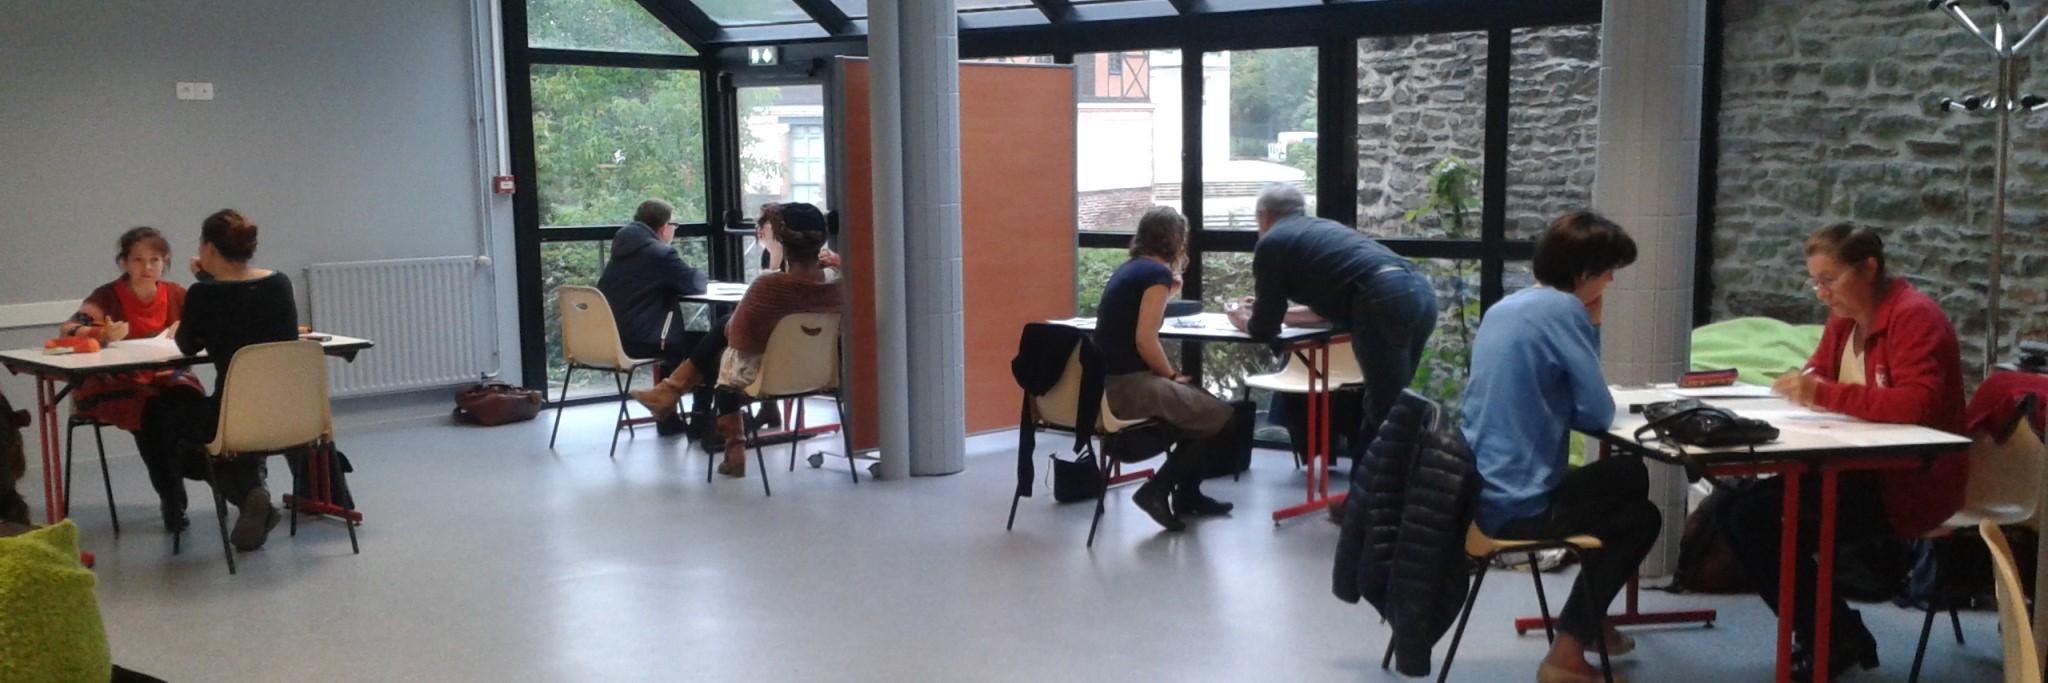 Atelier consultations - Rennes (35)